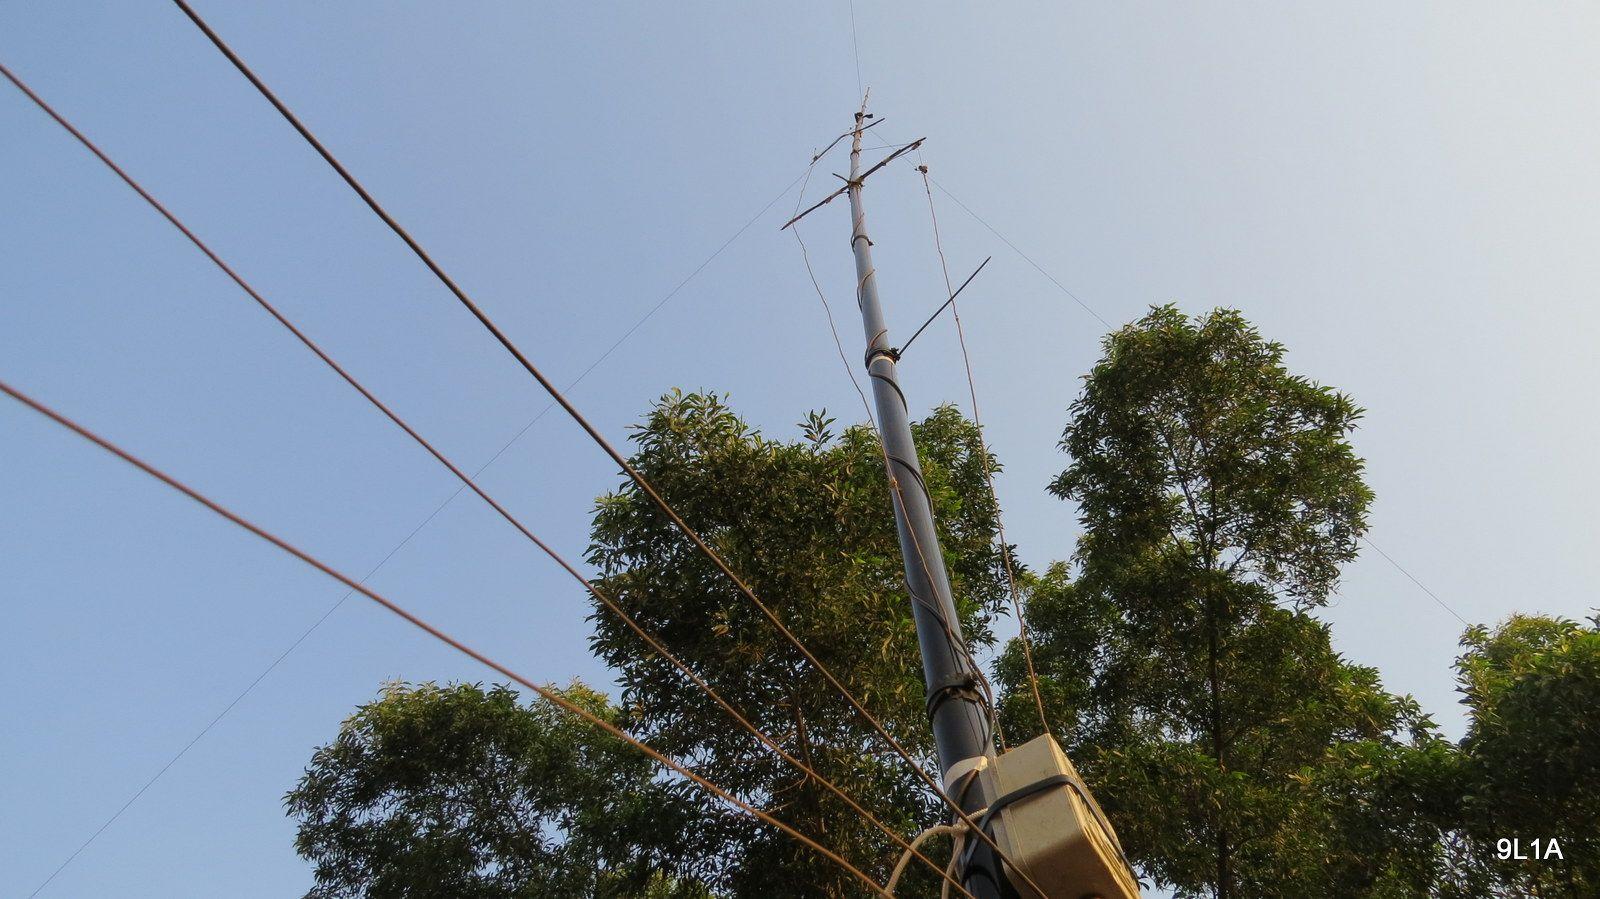 Sierra Leone 9L1A News Antenna 6